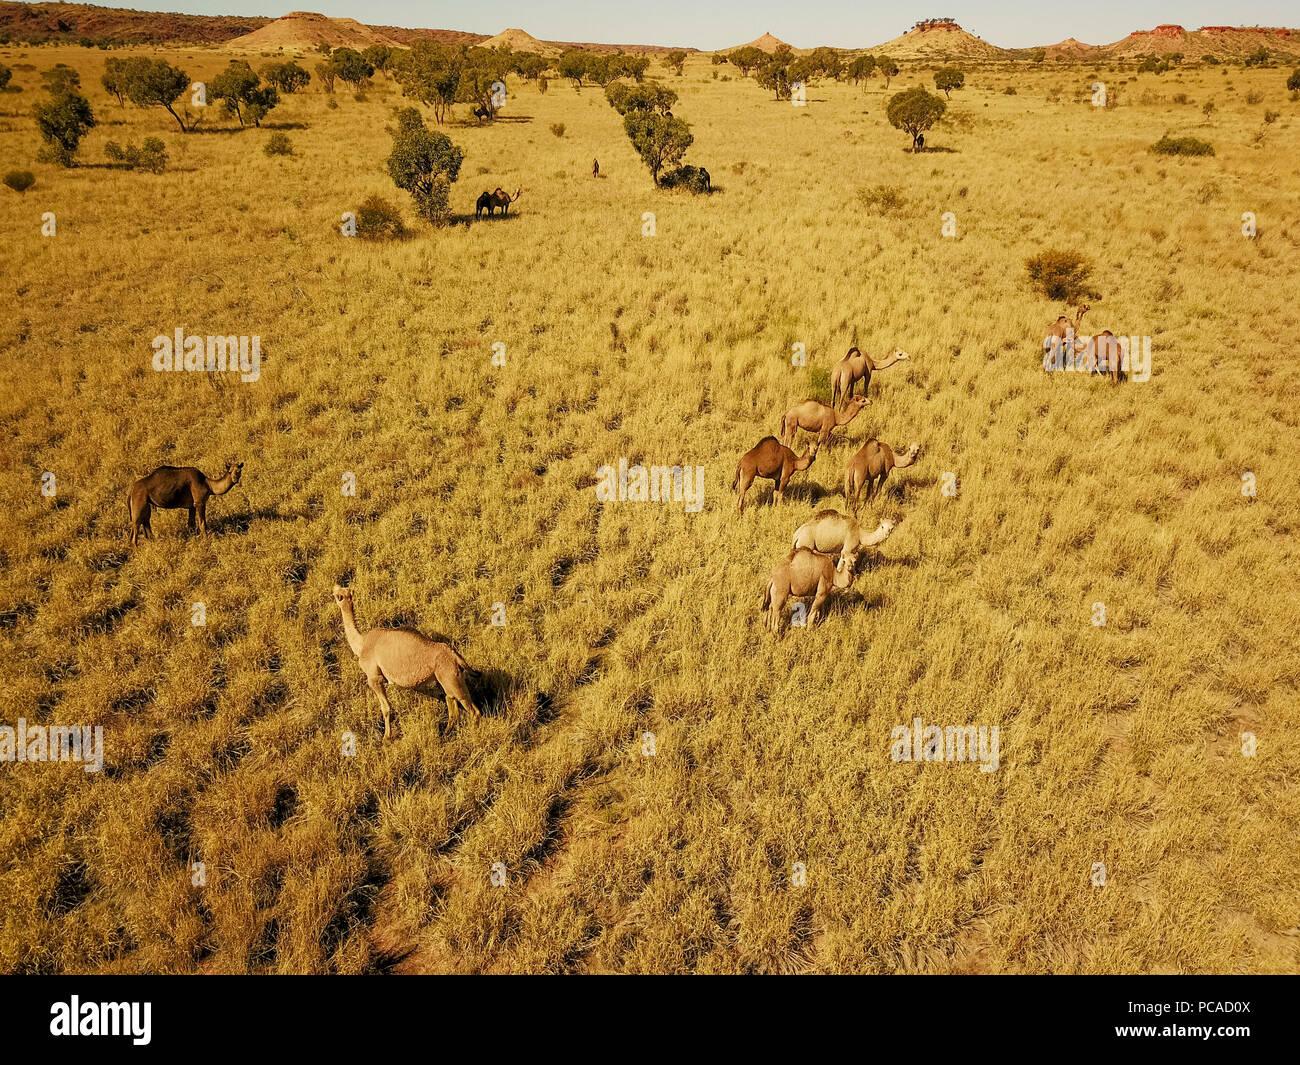 Camels in the Australian desert, near Laverton, Western Australia - Stock Image